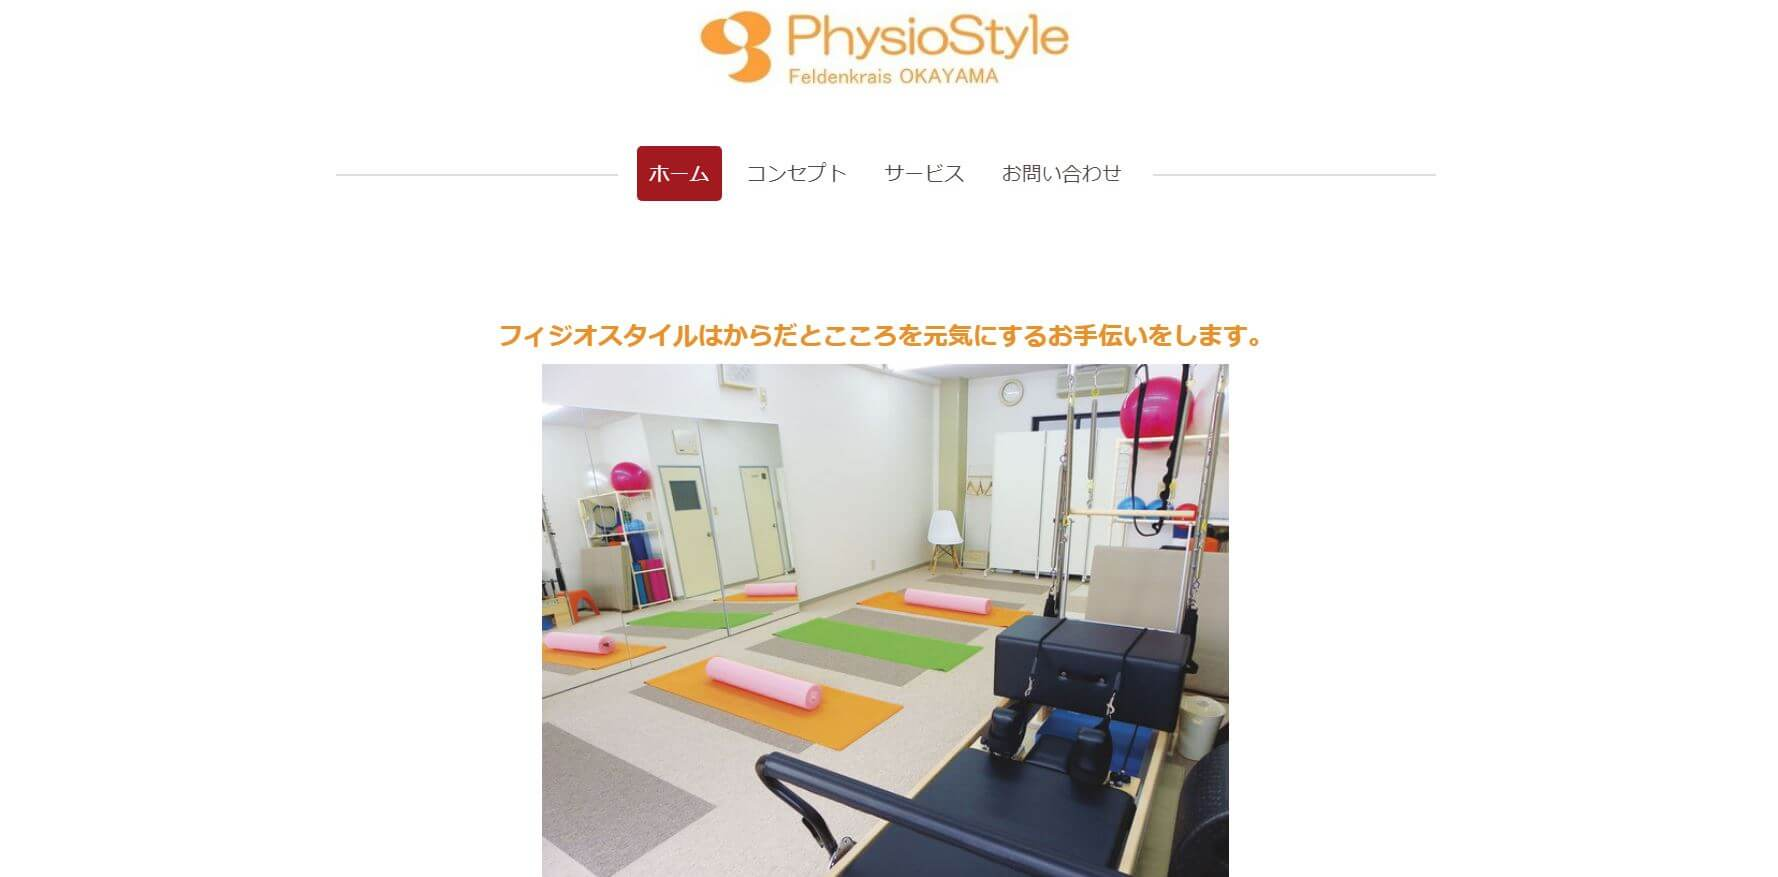 Physio style コンディショニングスタジオ フィジオスタイル